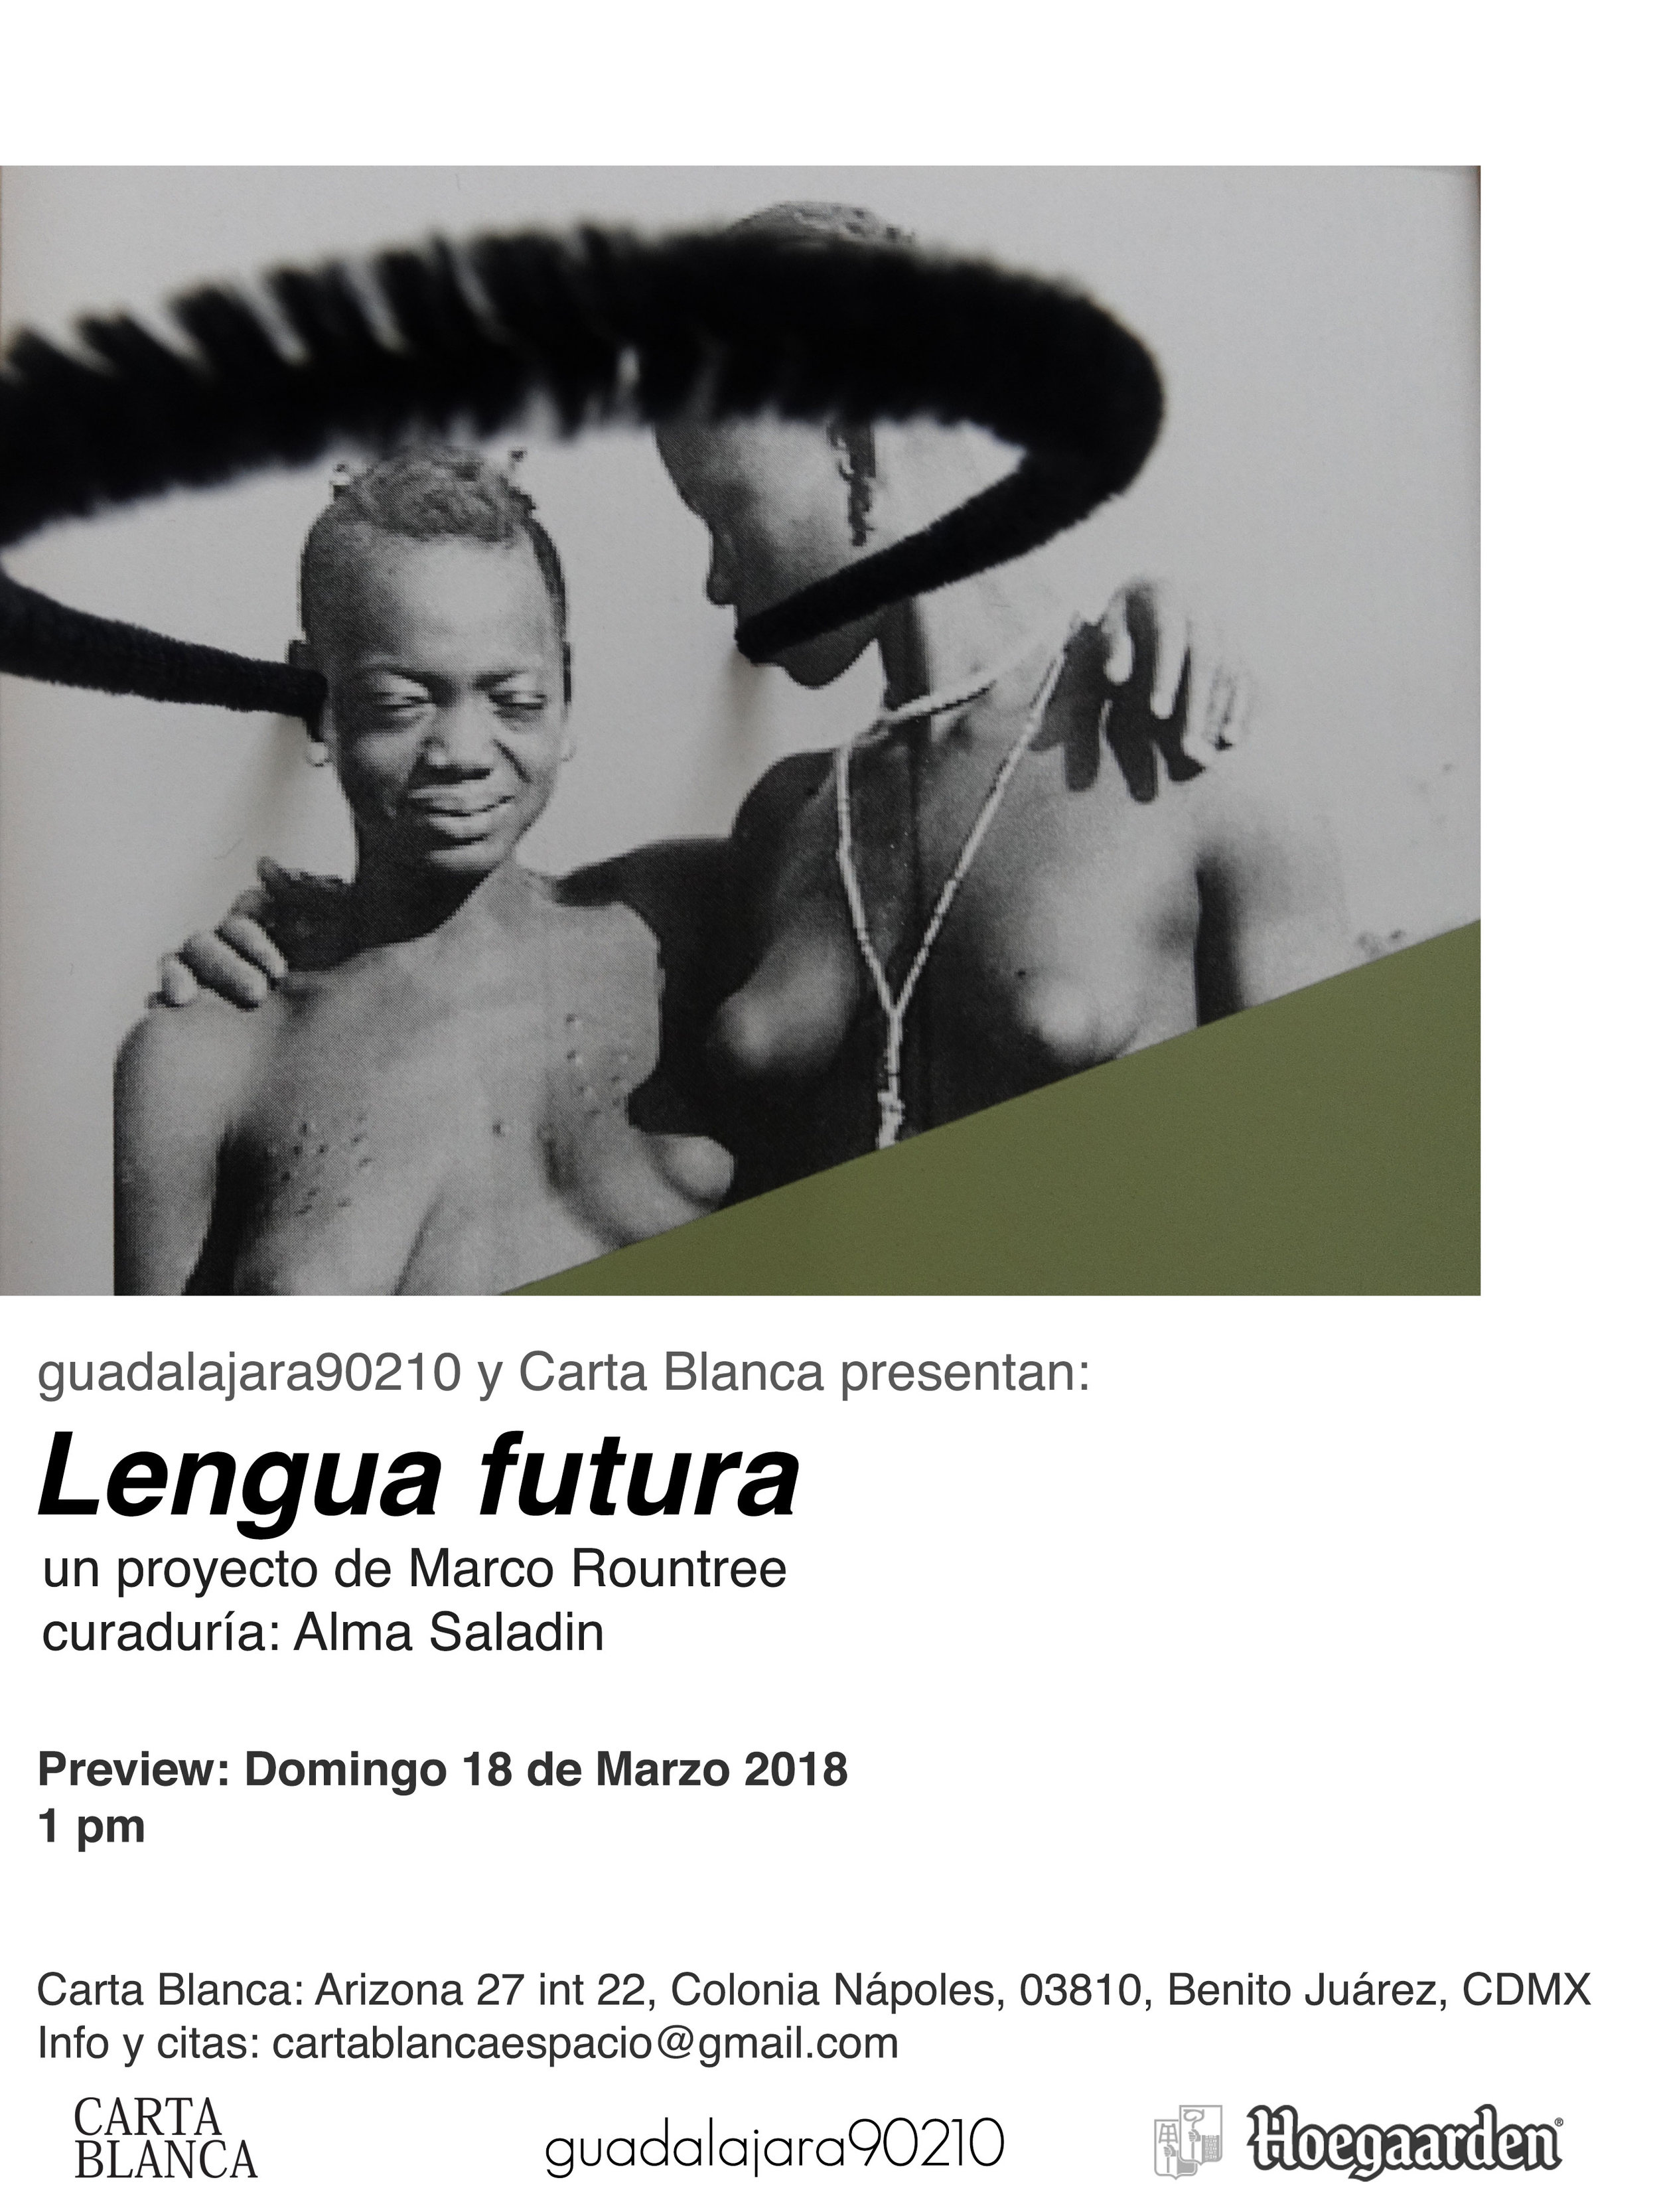 Lengua-futura-preview.jpg